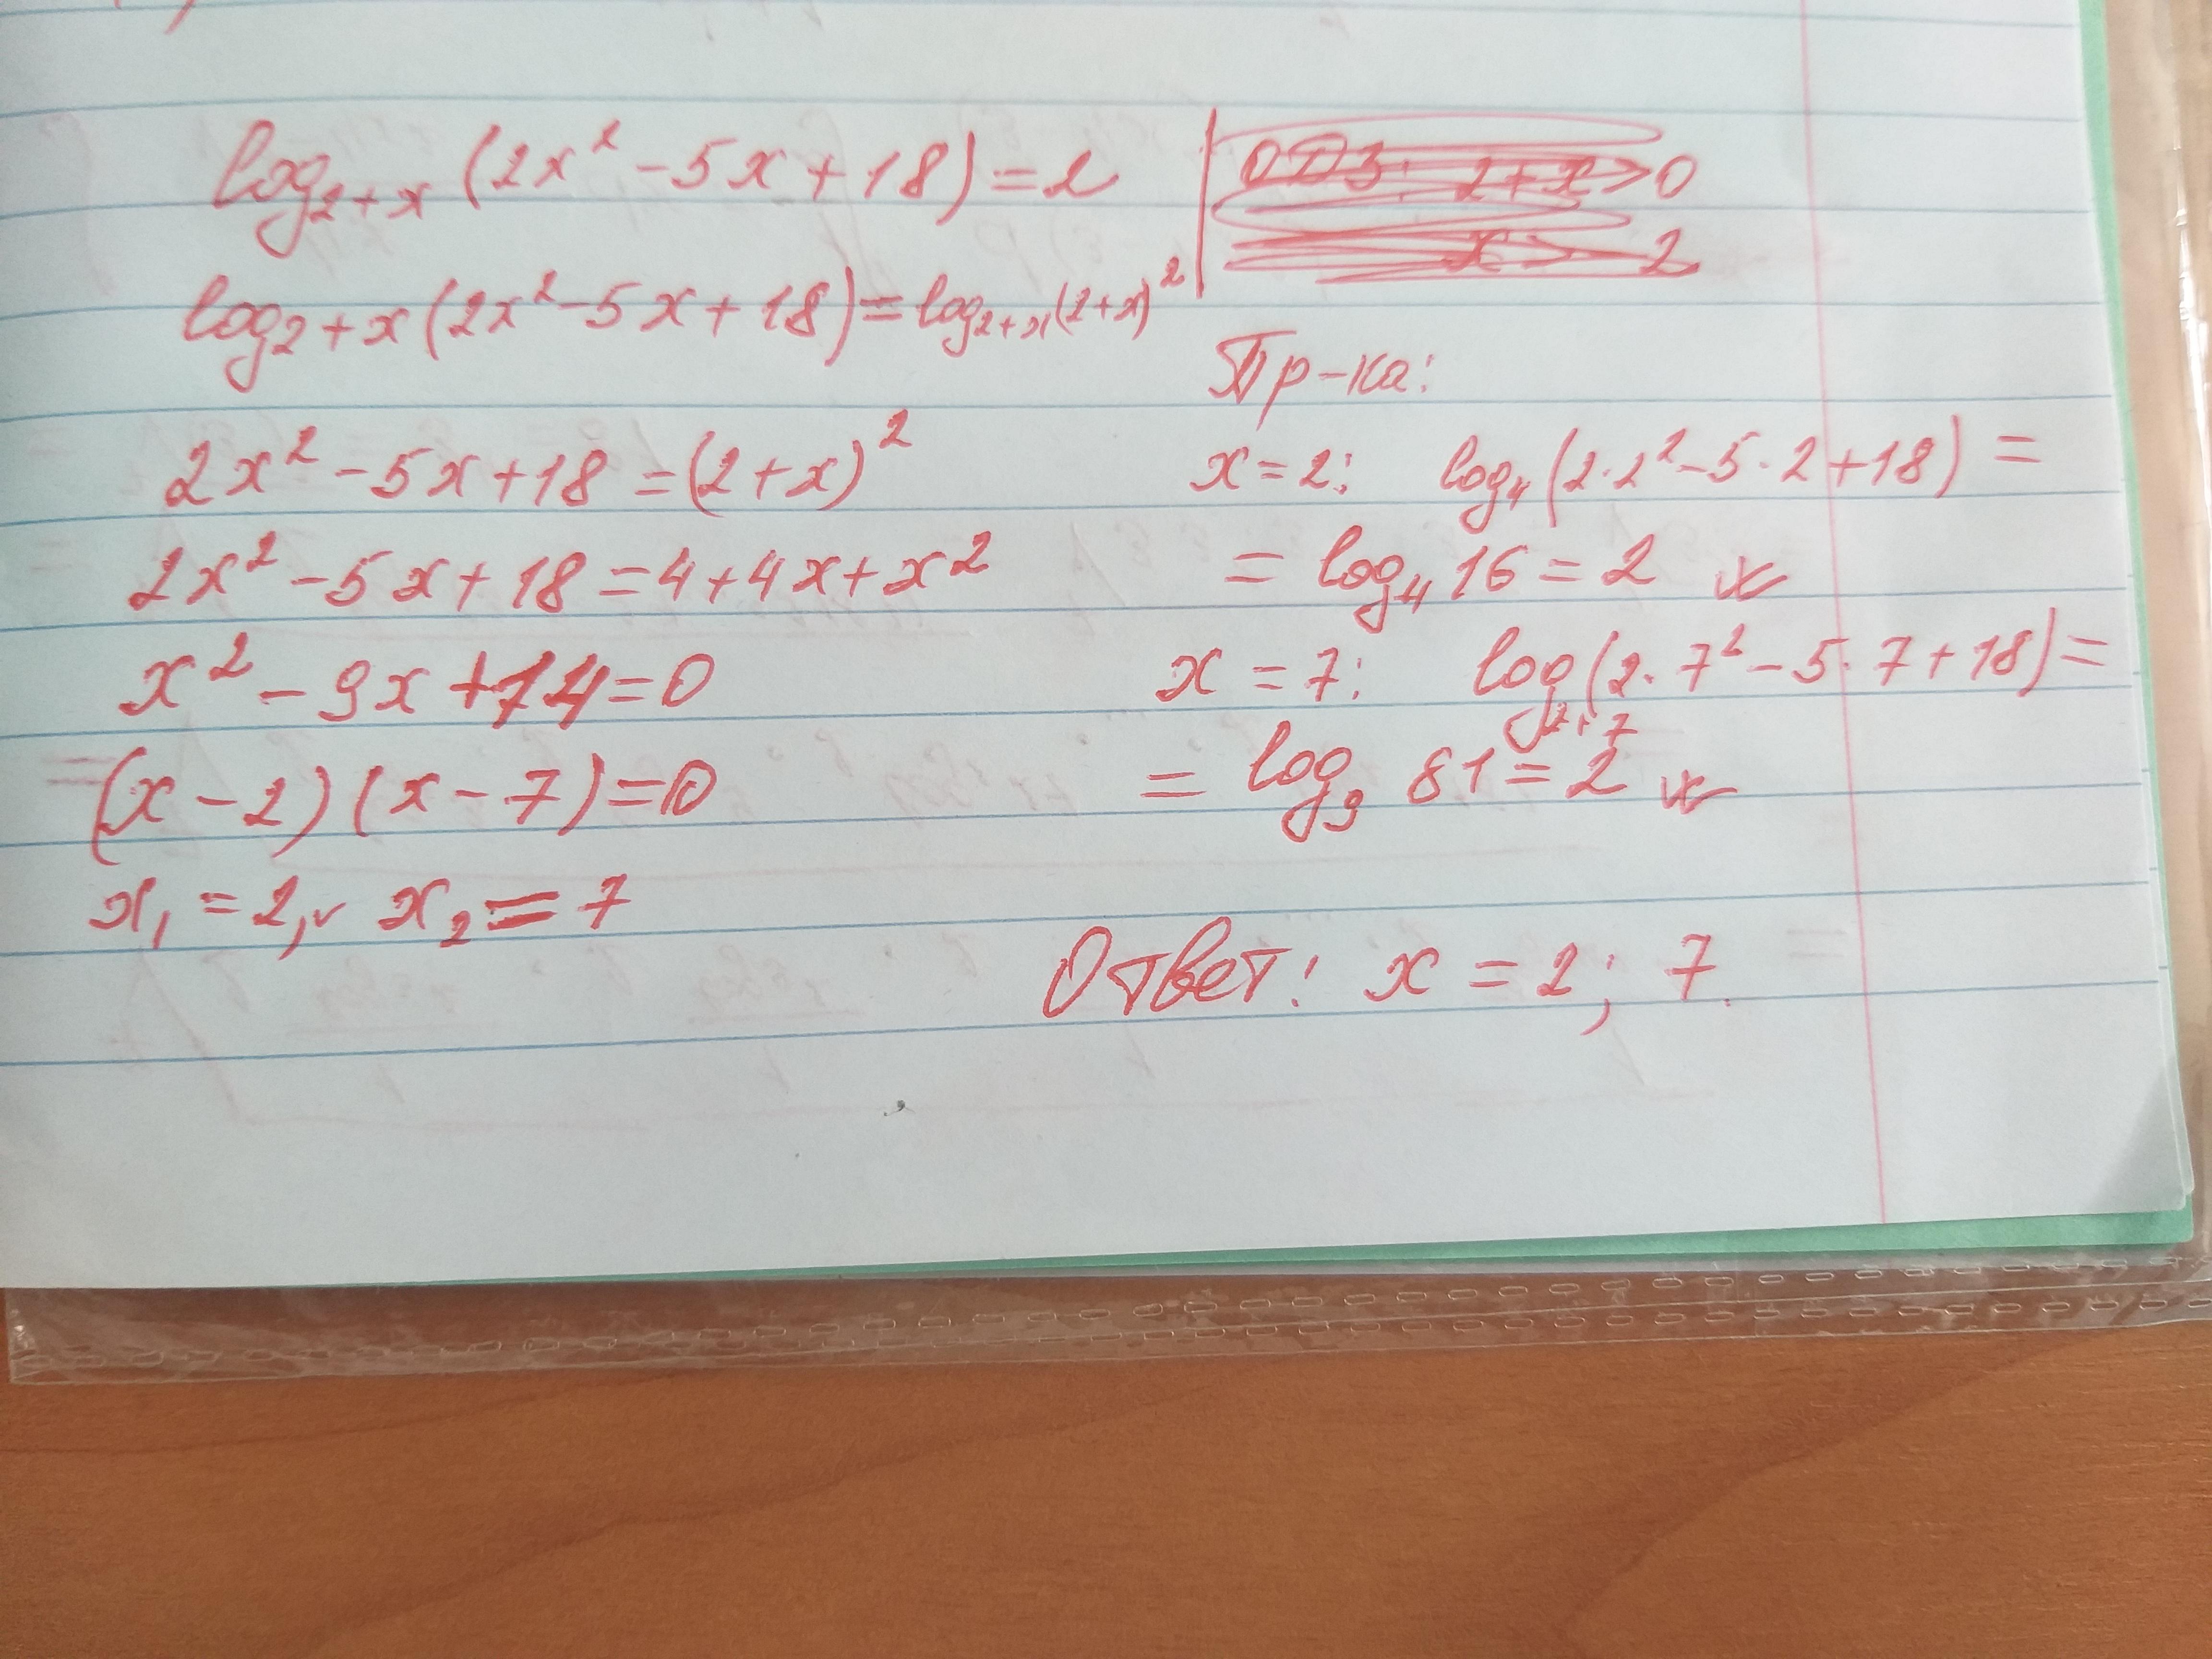 Log2+x(2x^-5x+18)=2